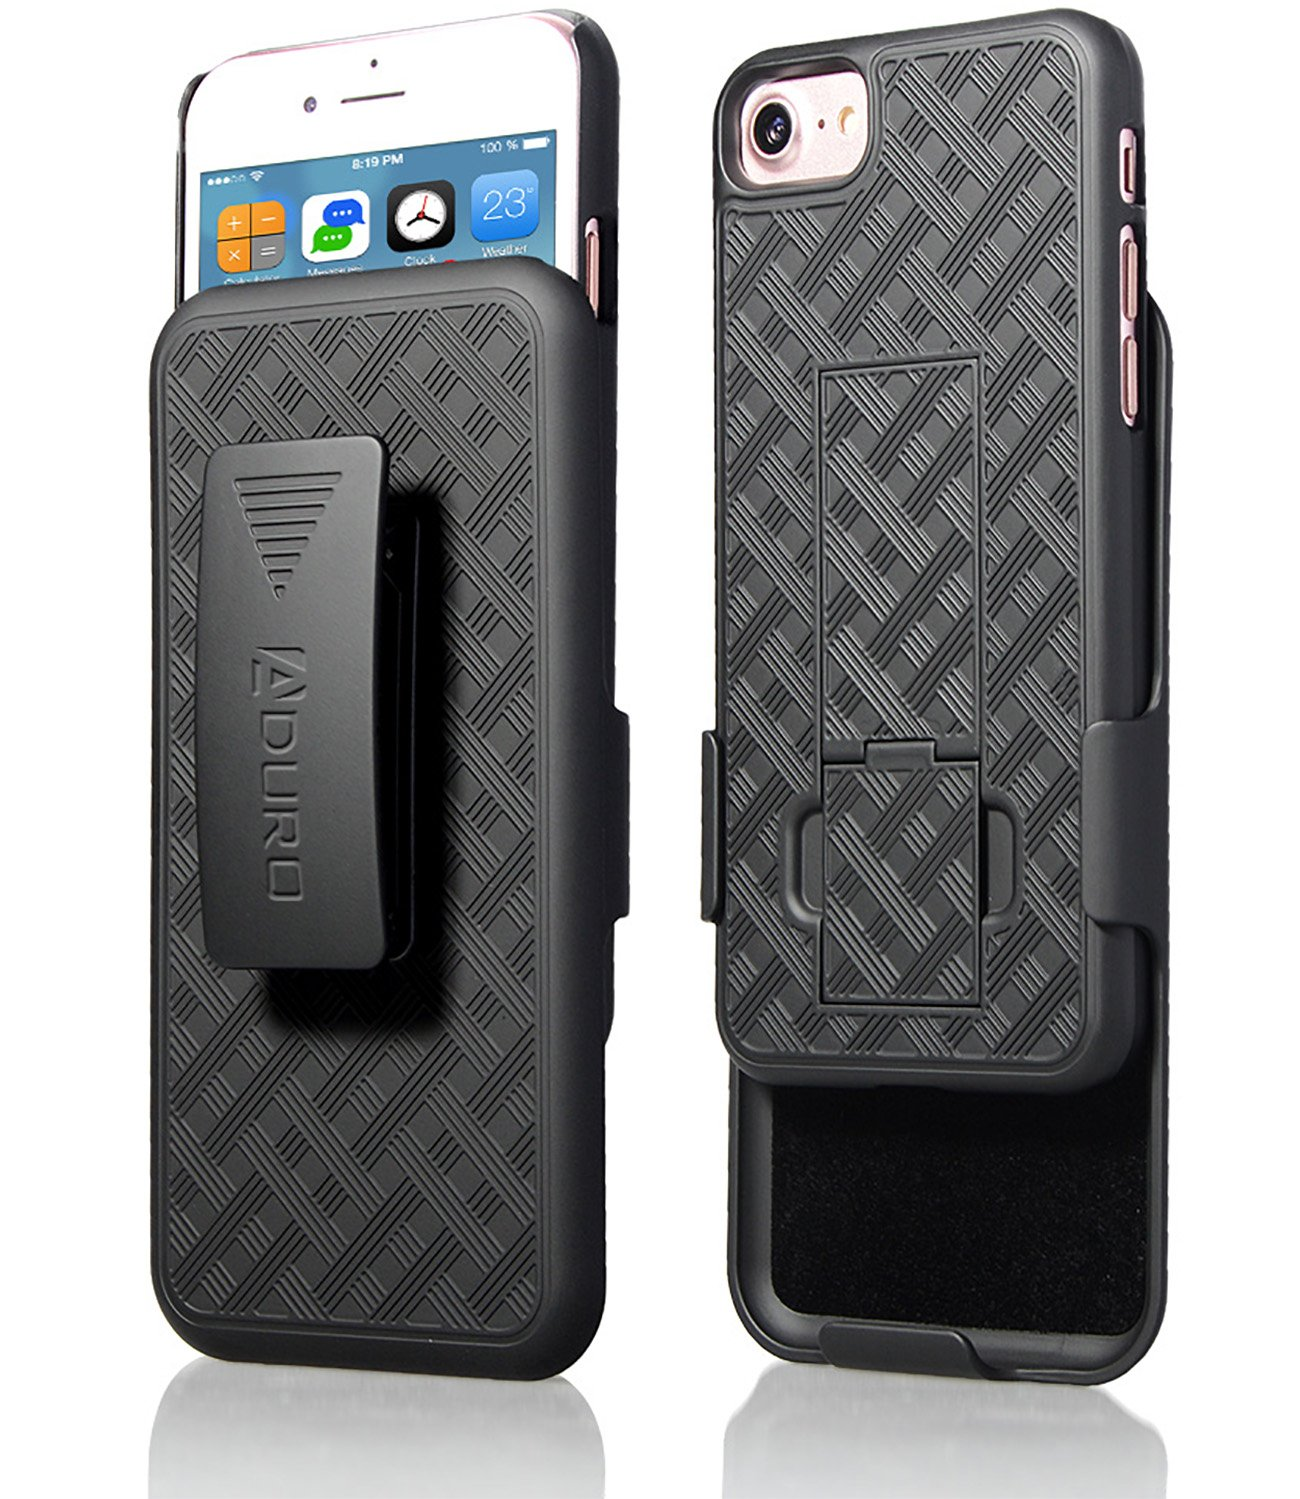 best website 7844e 18e4c iPhone 8/7 Holster Case, Aduro Combo Shell & Holster Case - Super Slim  Shell Case with Built-in Kickstand, Swivel Belt Clip Holster for Apple  iPhone ...